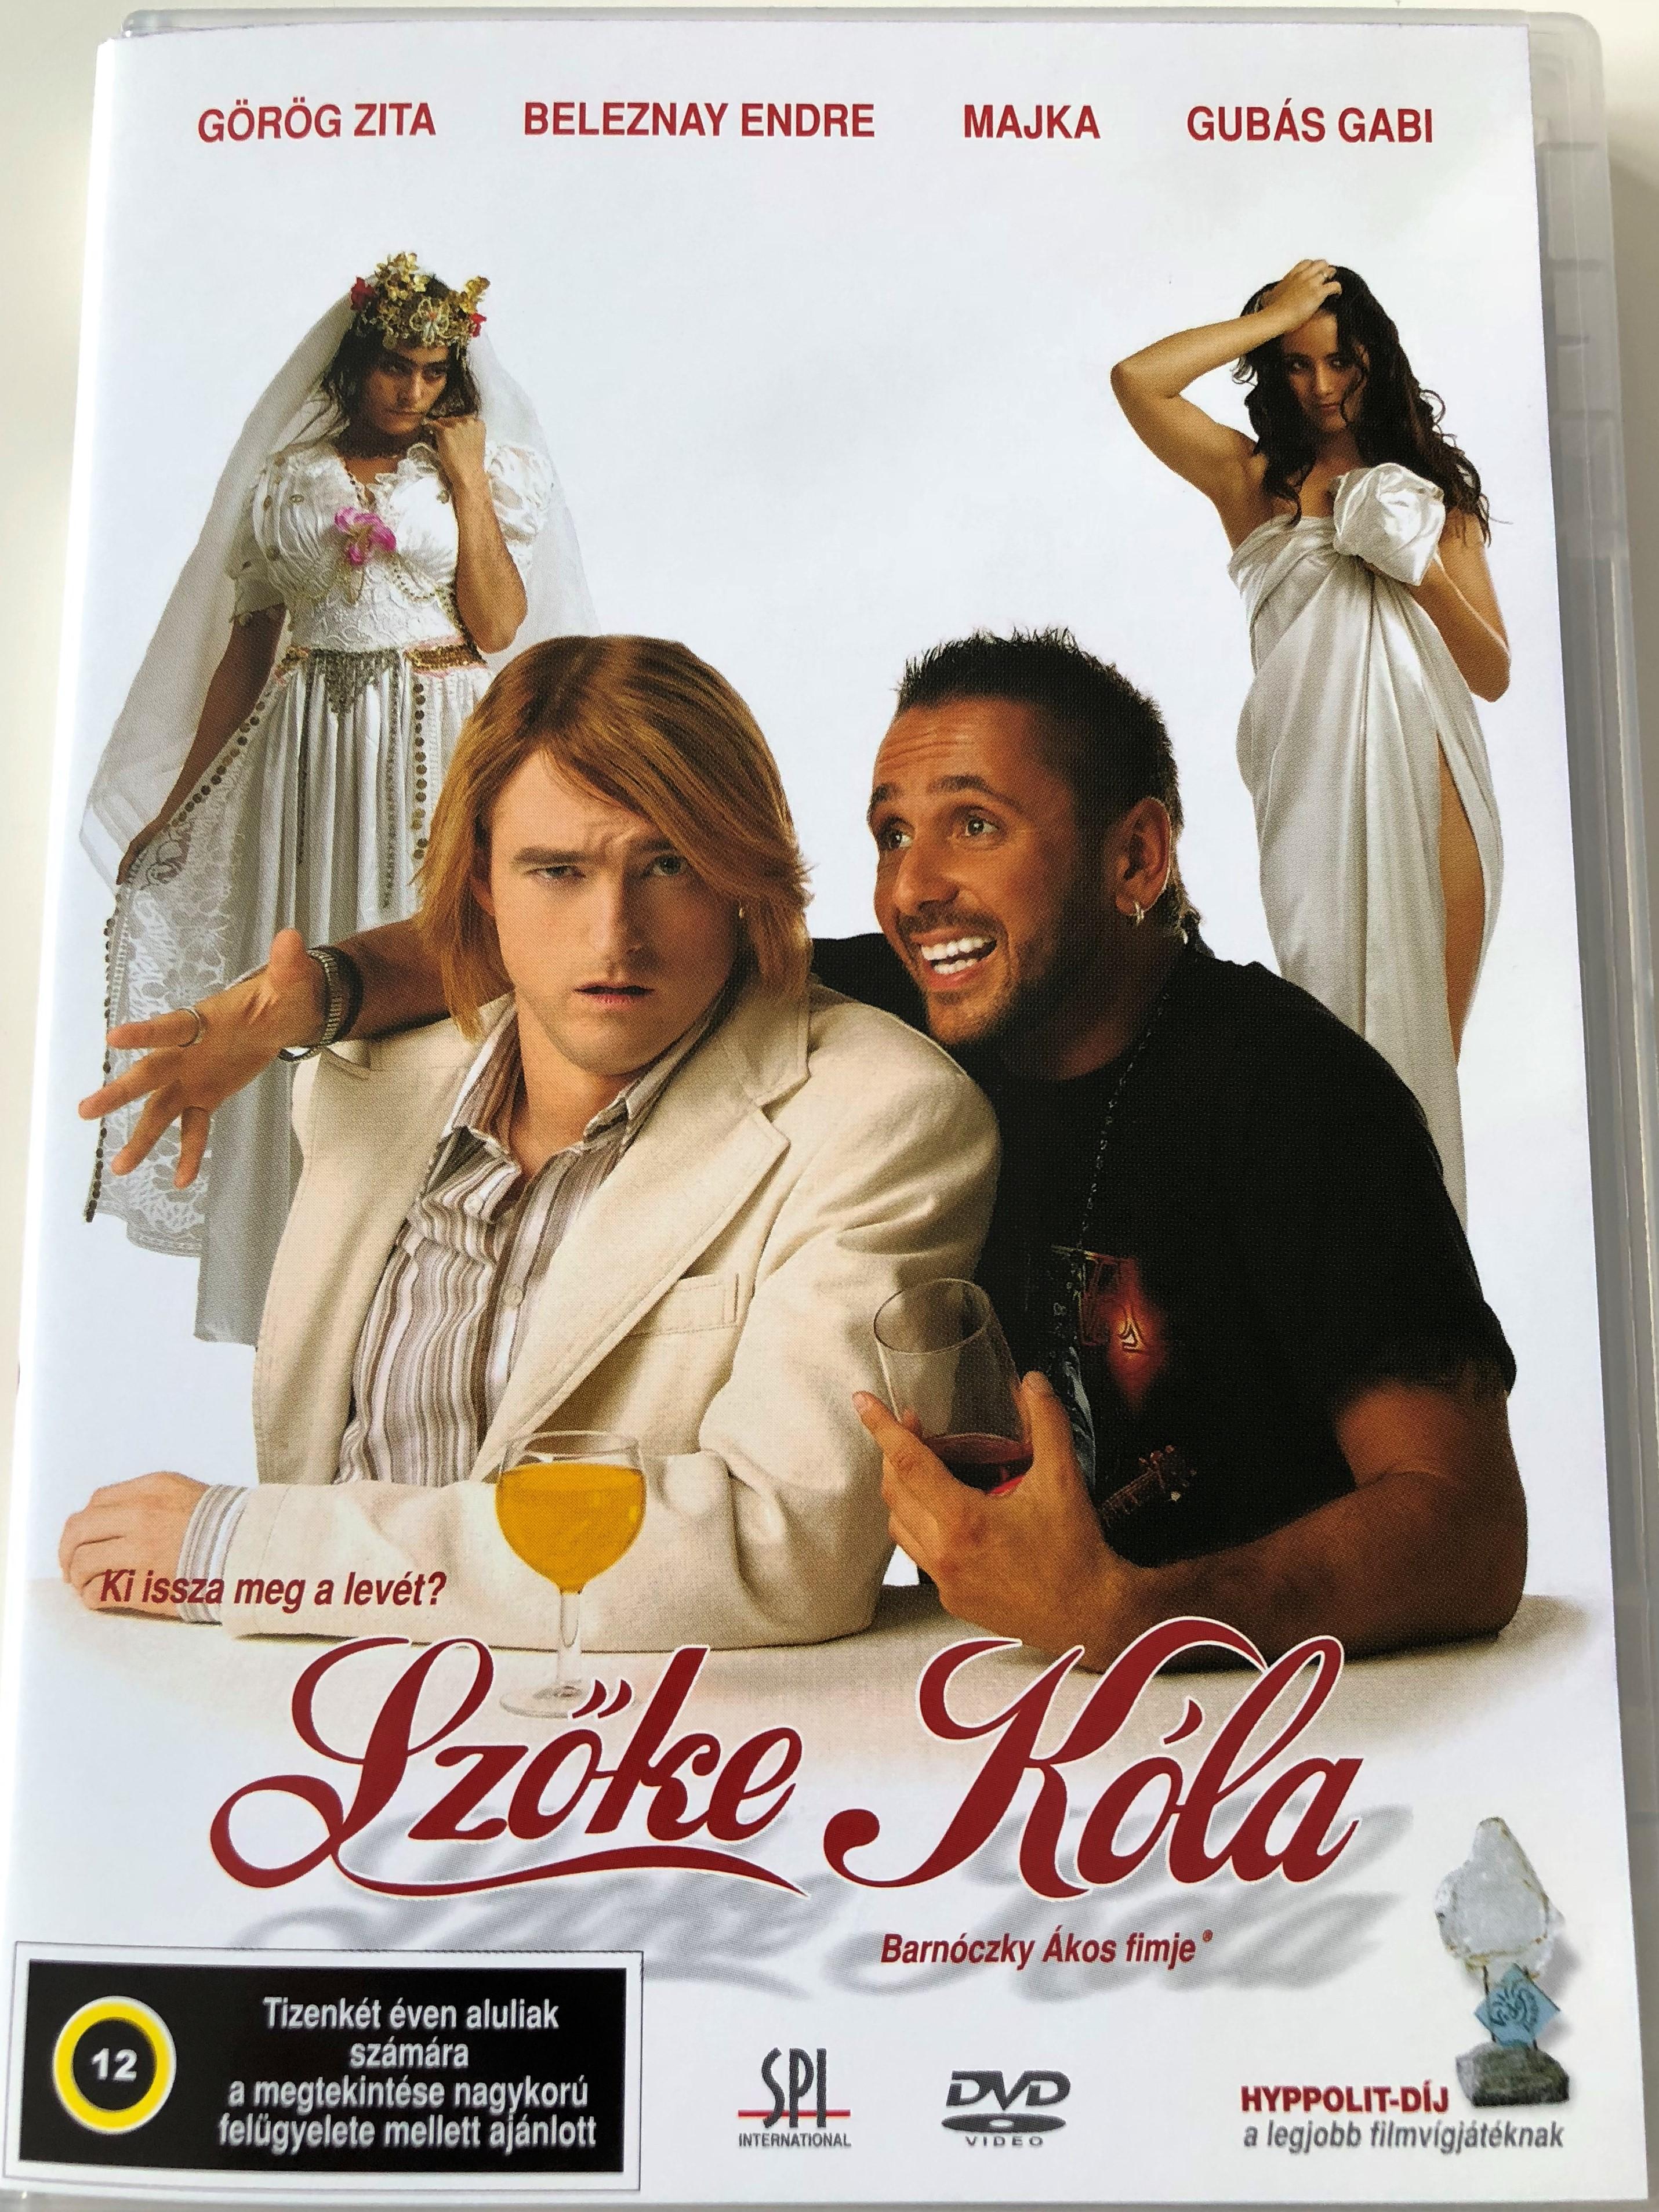 sz-ke-k-la-dvd-2005-blonde-cola-directed-by-barn-czky-kos-starring-g-r-g-zita-beleznay-endre-majka-gub-s-gabi-1-.jpg